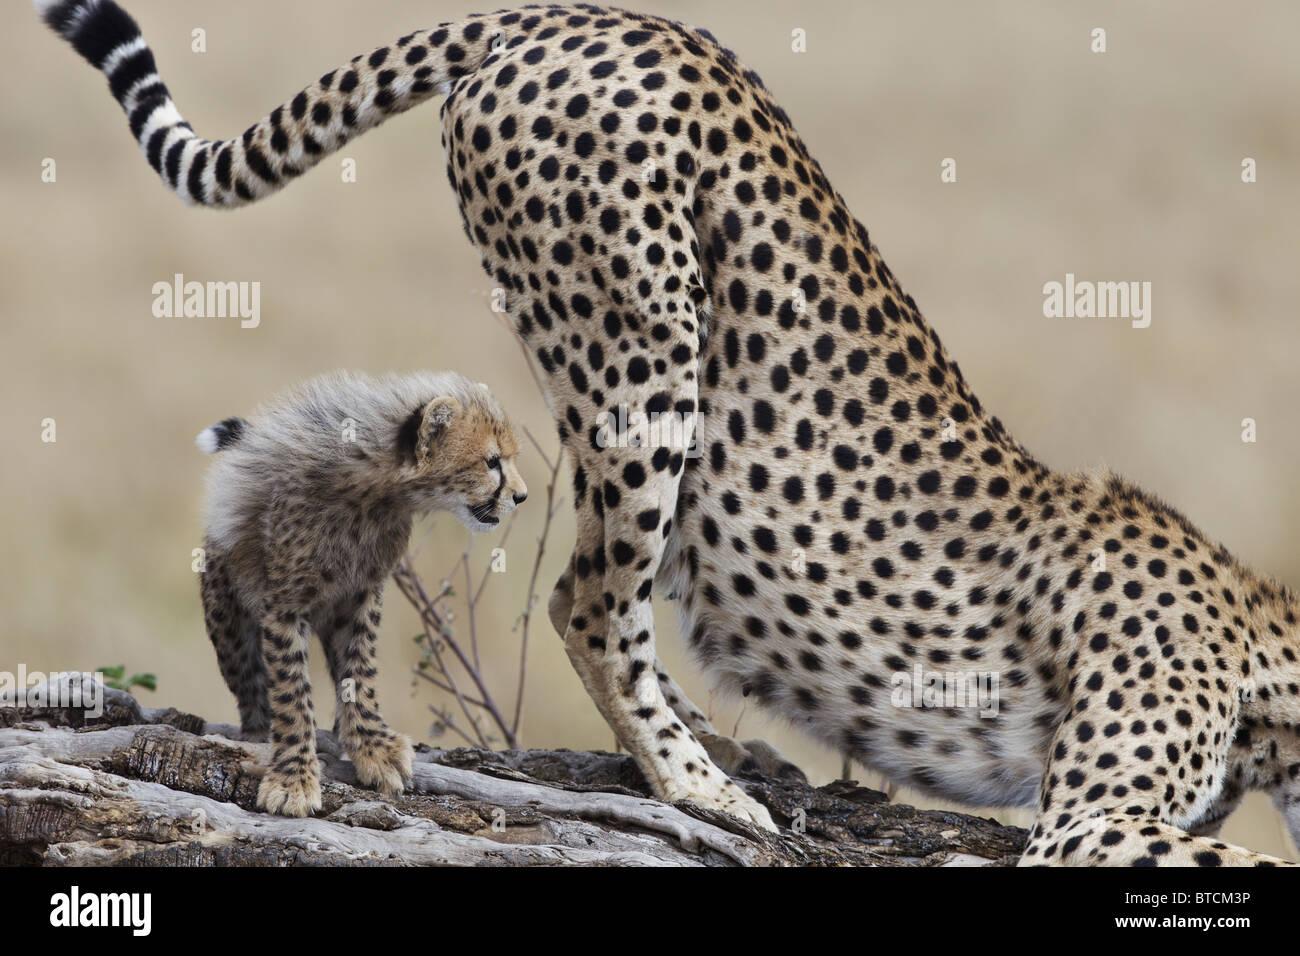 Femmina di ghepardo (Acinonyx jubatus) con cub profumo di marcatura. Immagini Stock